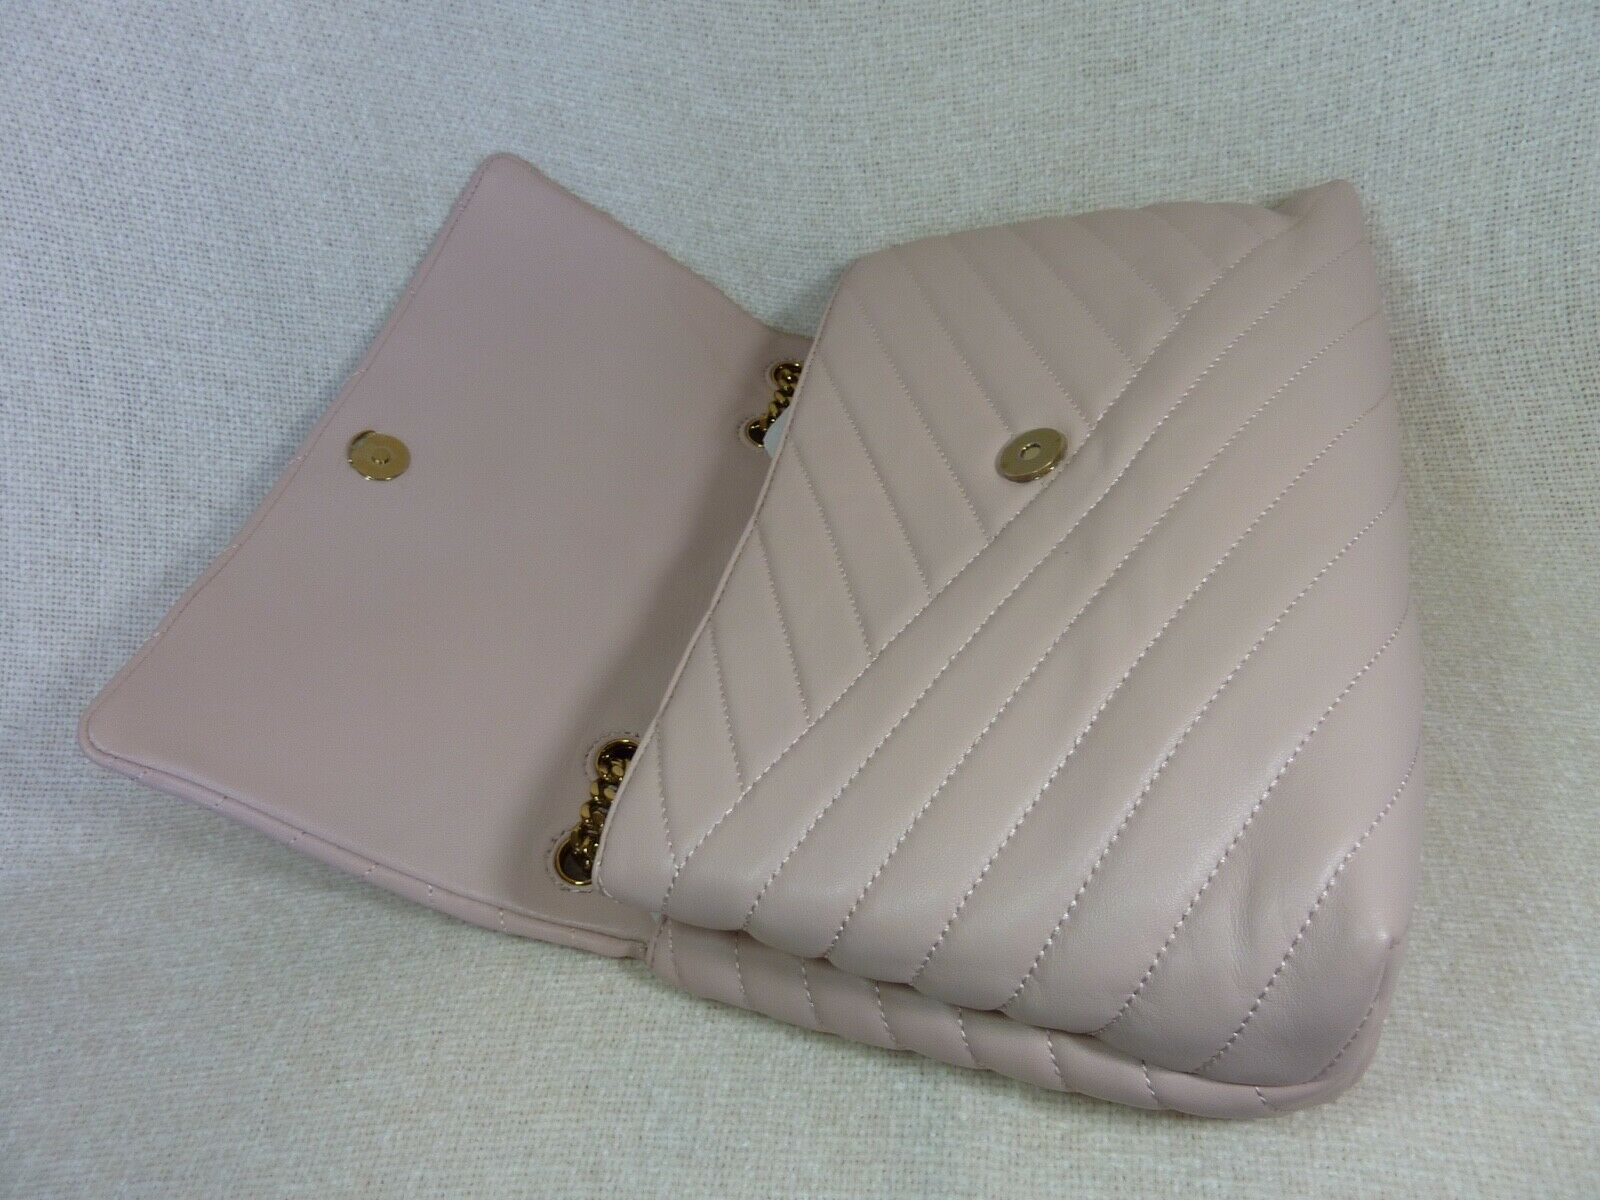 NWT Tory Burch Pink Moon Kira Chevron Convertible Shoulder Bag $528 image 9